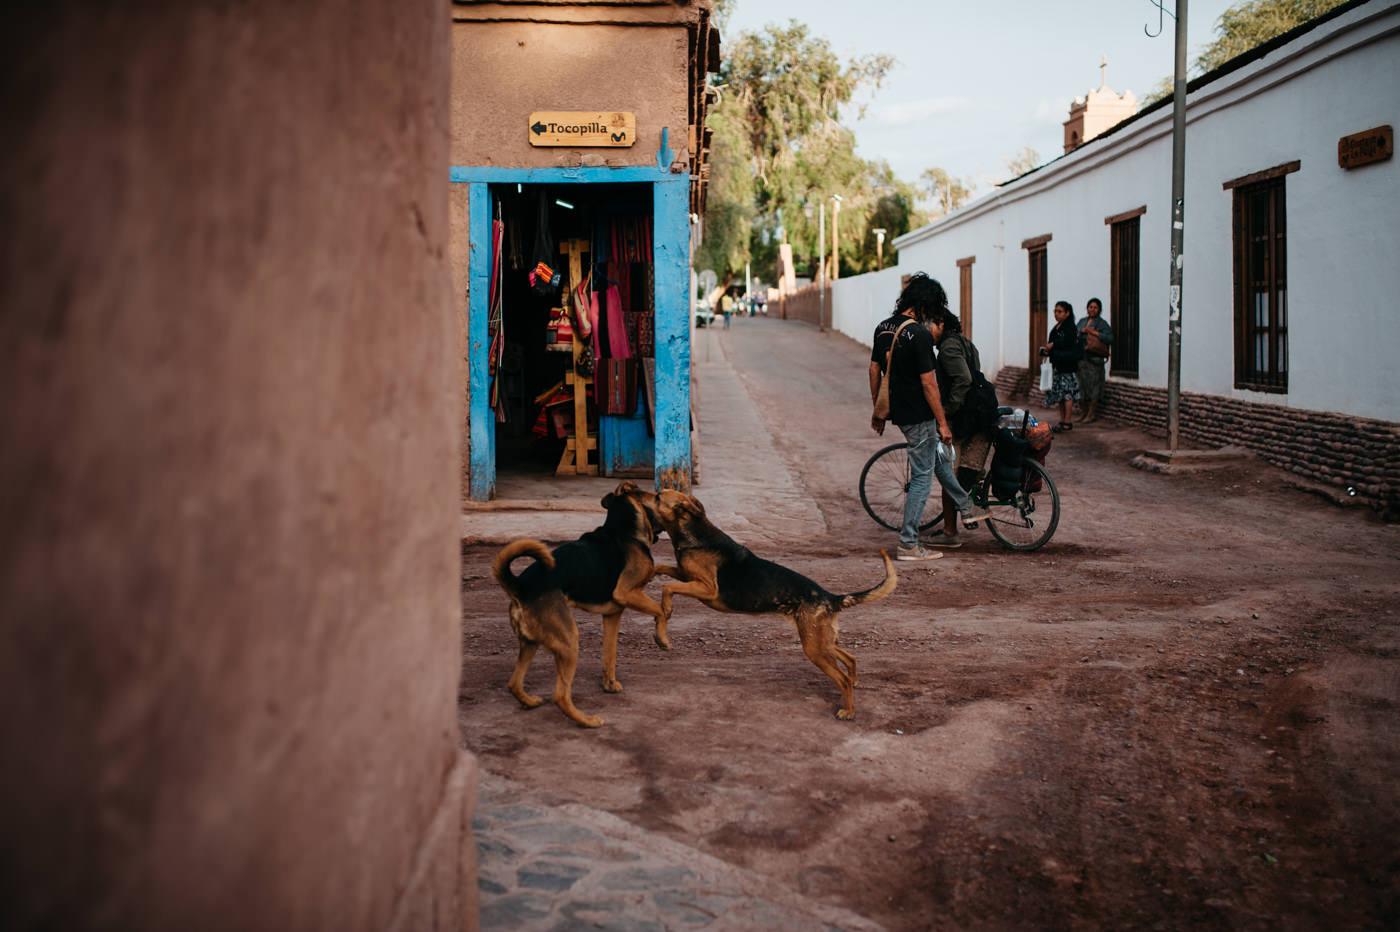 Chile San Pedro de Atacama wild dogs in the streets